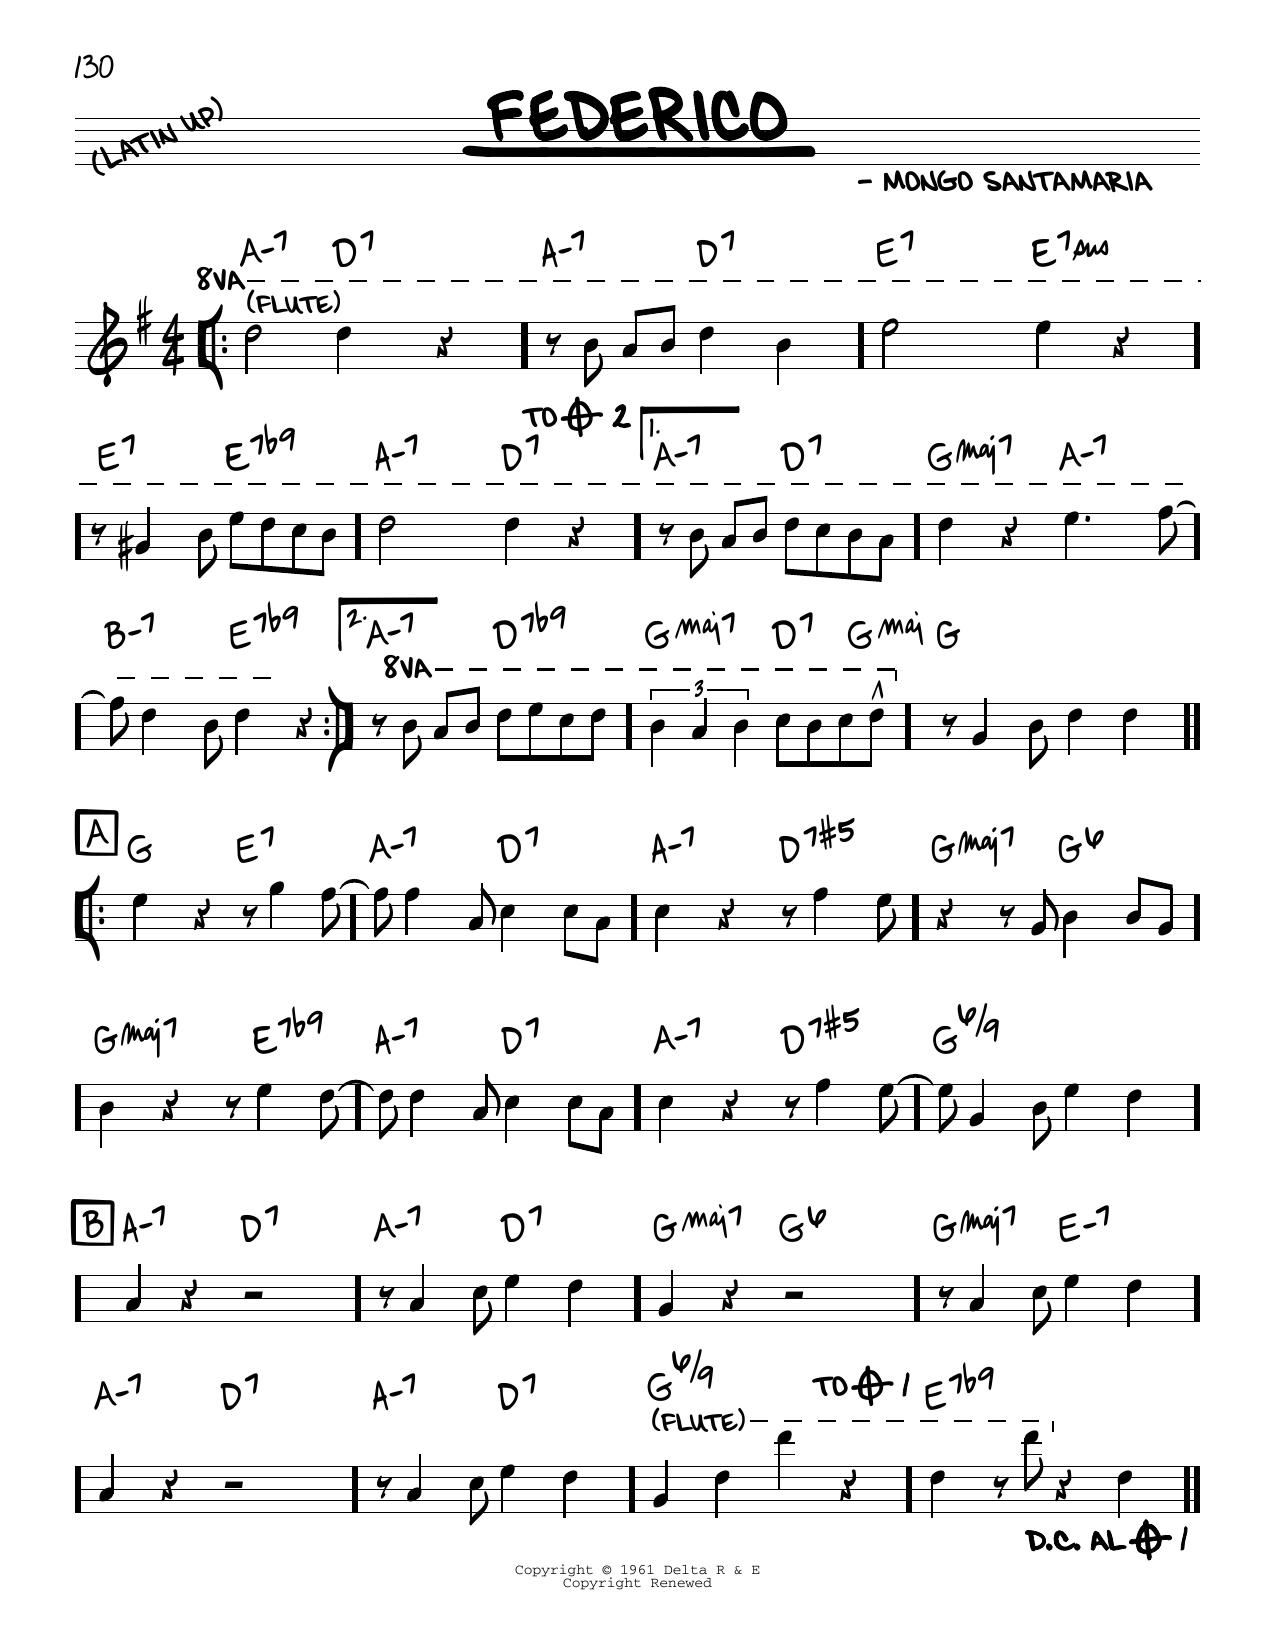 Mongo Santamaria Federico sheet music notes and chords. Download Printable PDF.